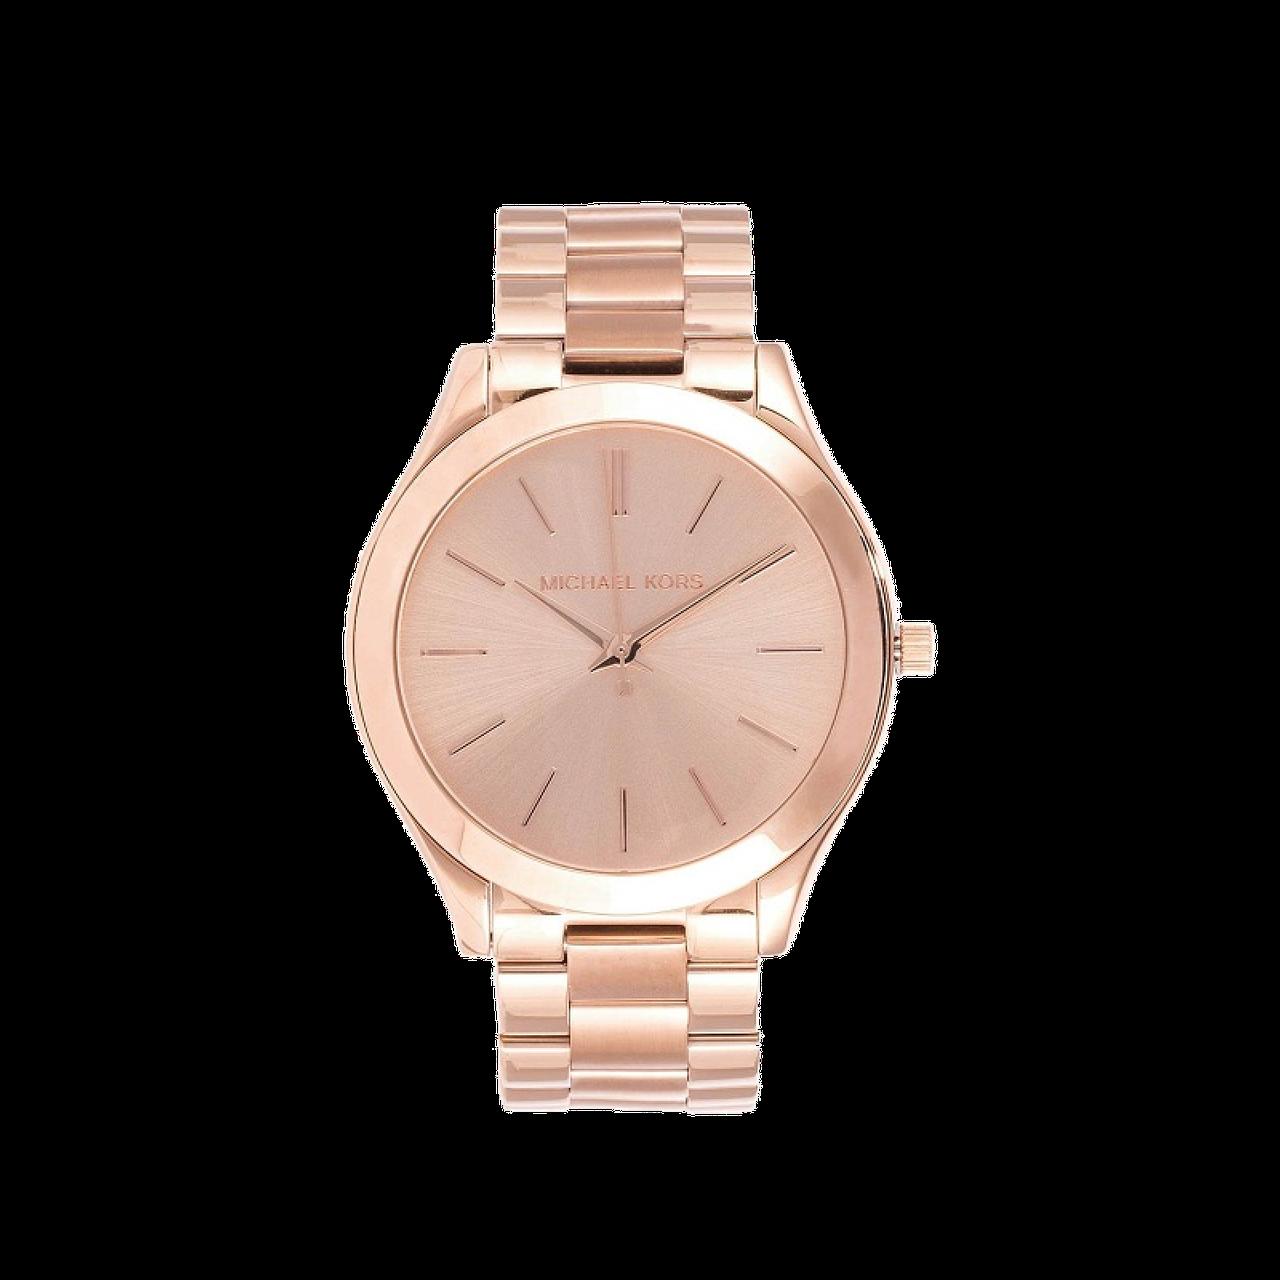 Женские часы Michael Kors MK3197